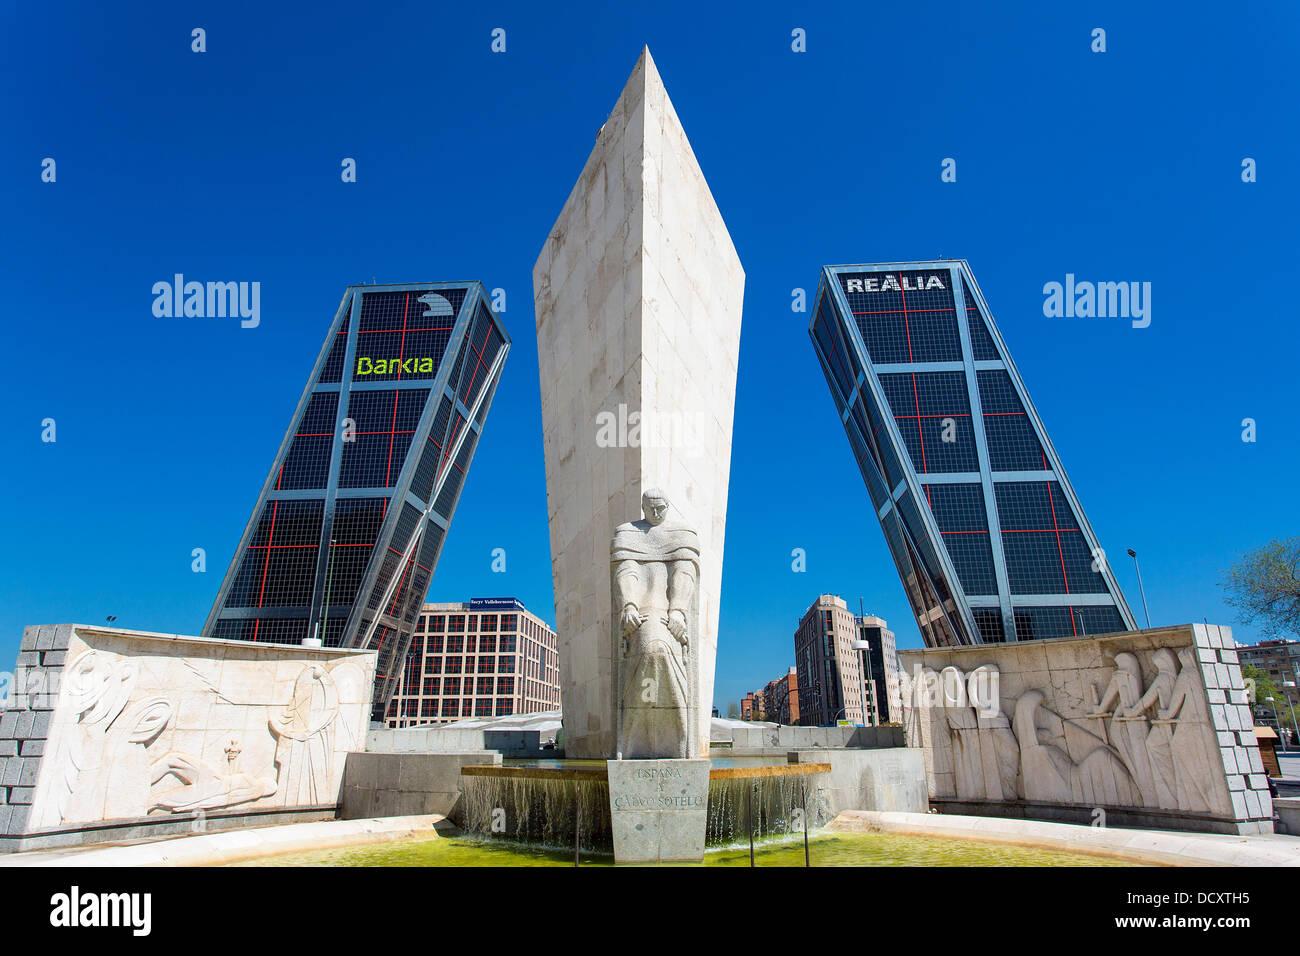 Madrid, Puerta de Europa Photo Stock